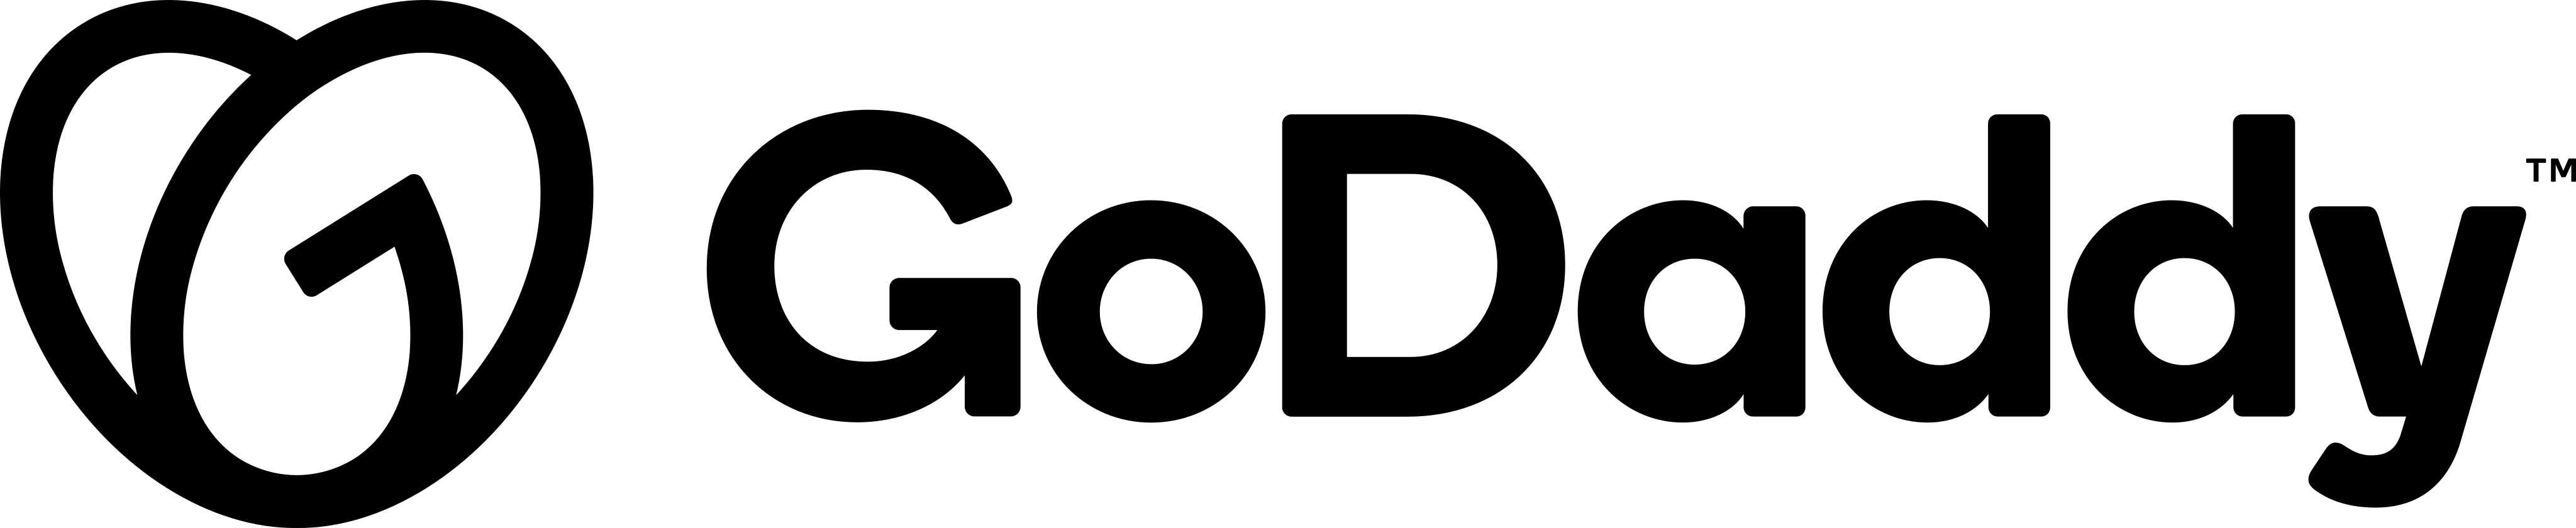 godaddy logo 8